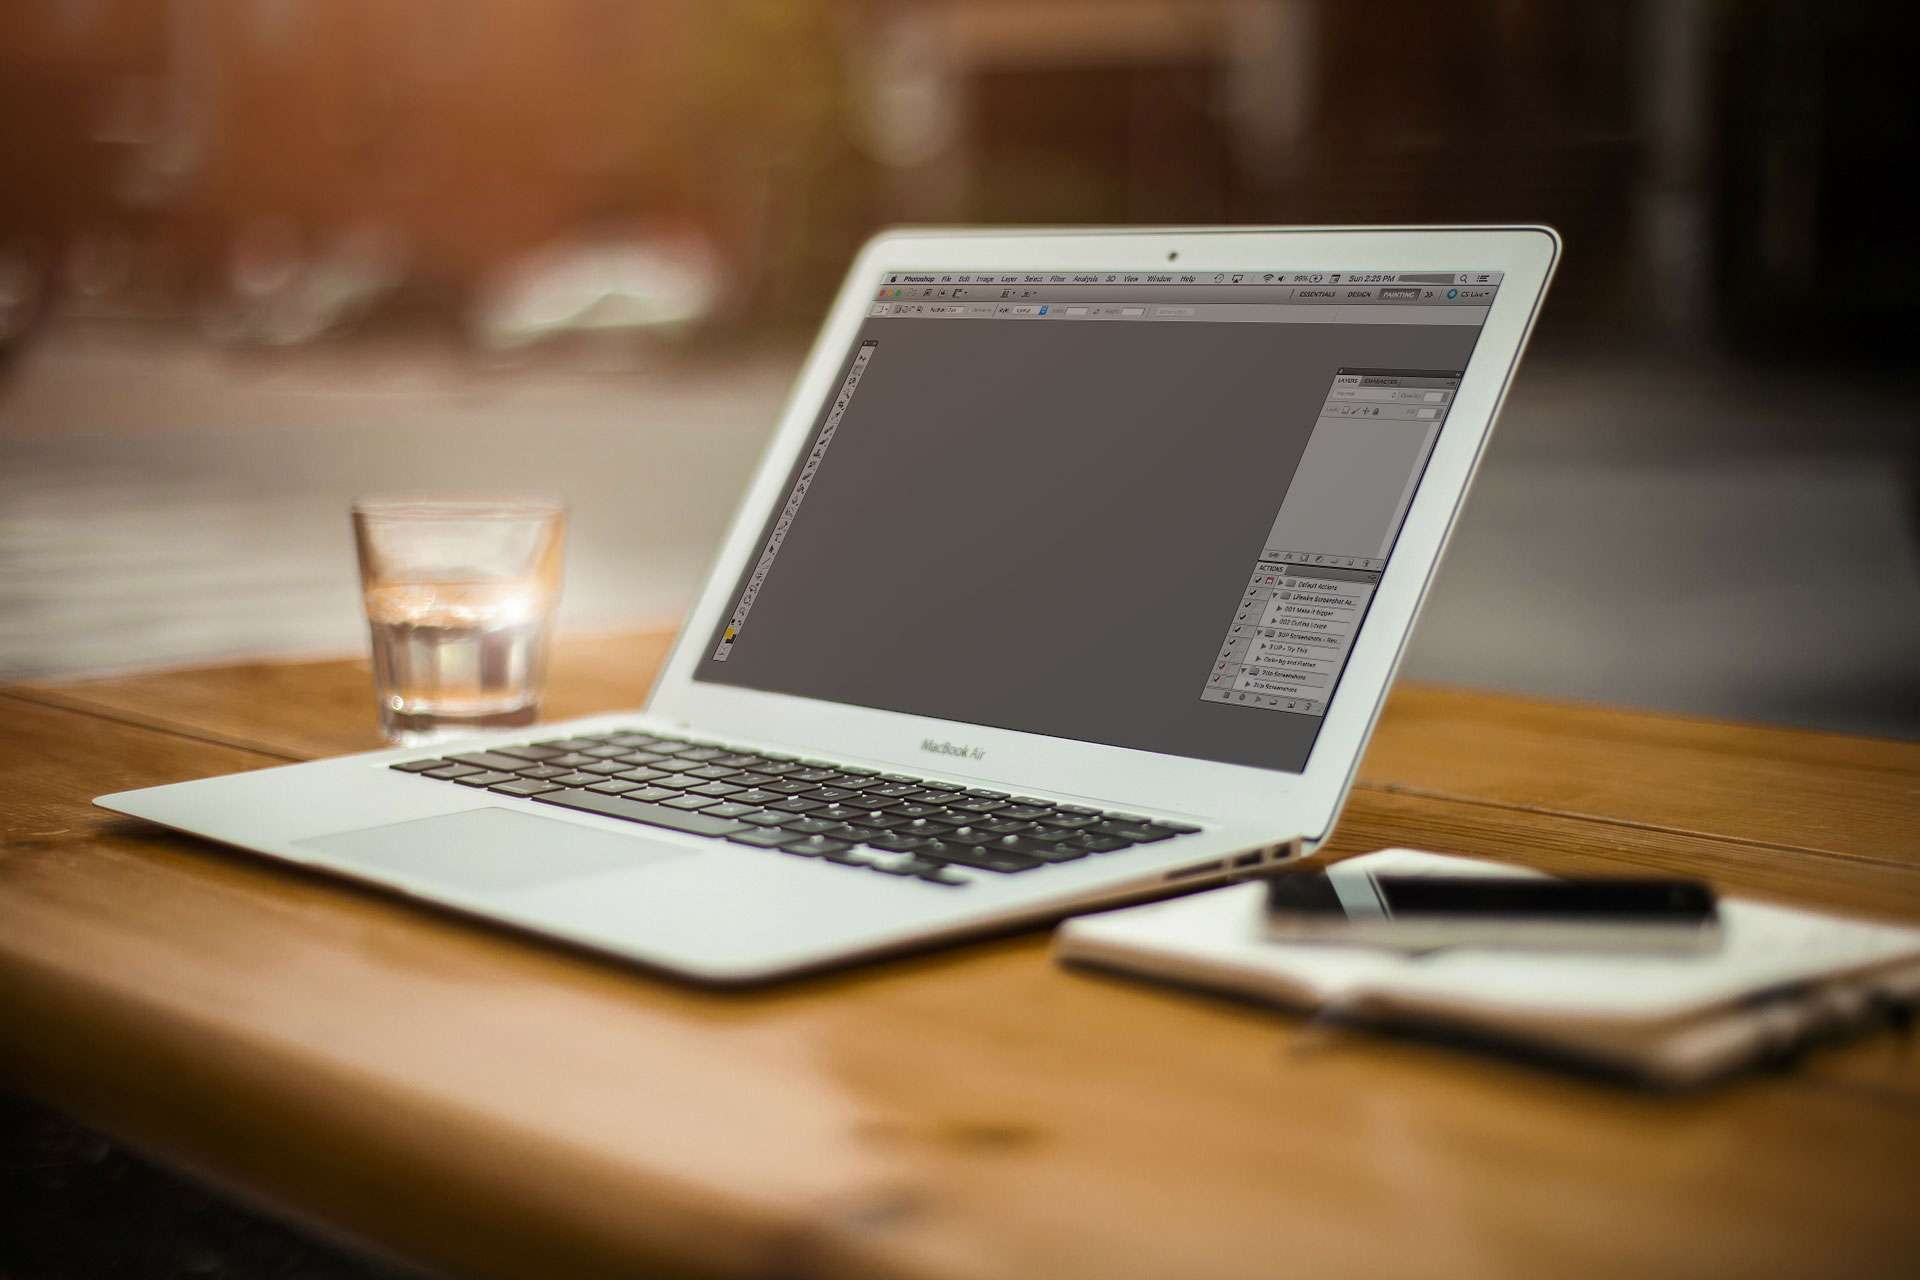 A Macbook Air running Photoshop